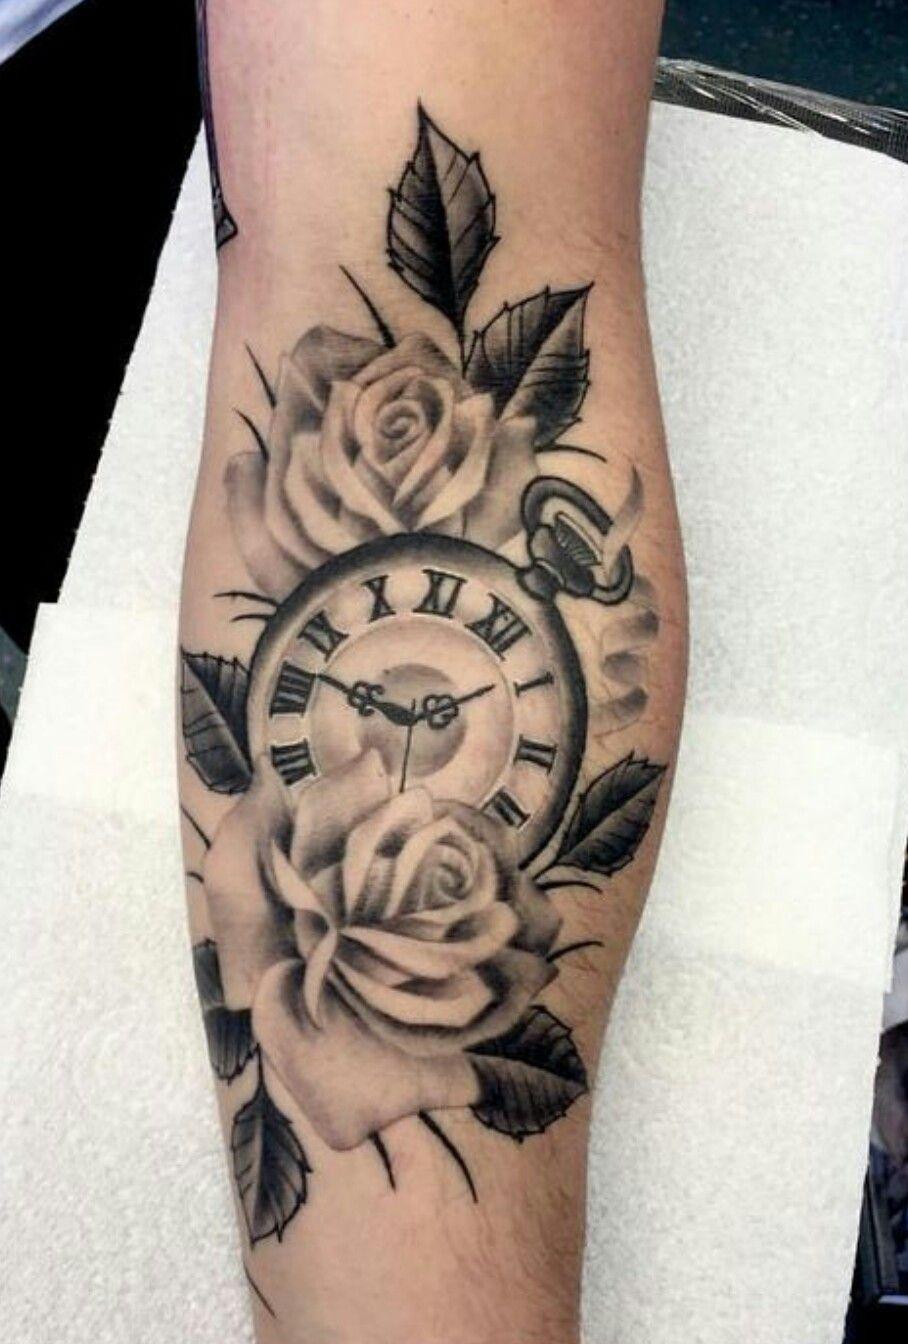 Pin By Courtniie Rainey On Tattoo Ideas Pinterest